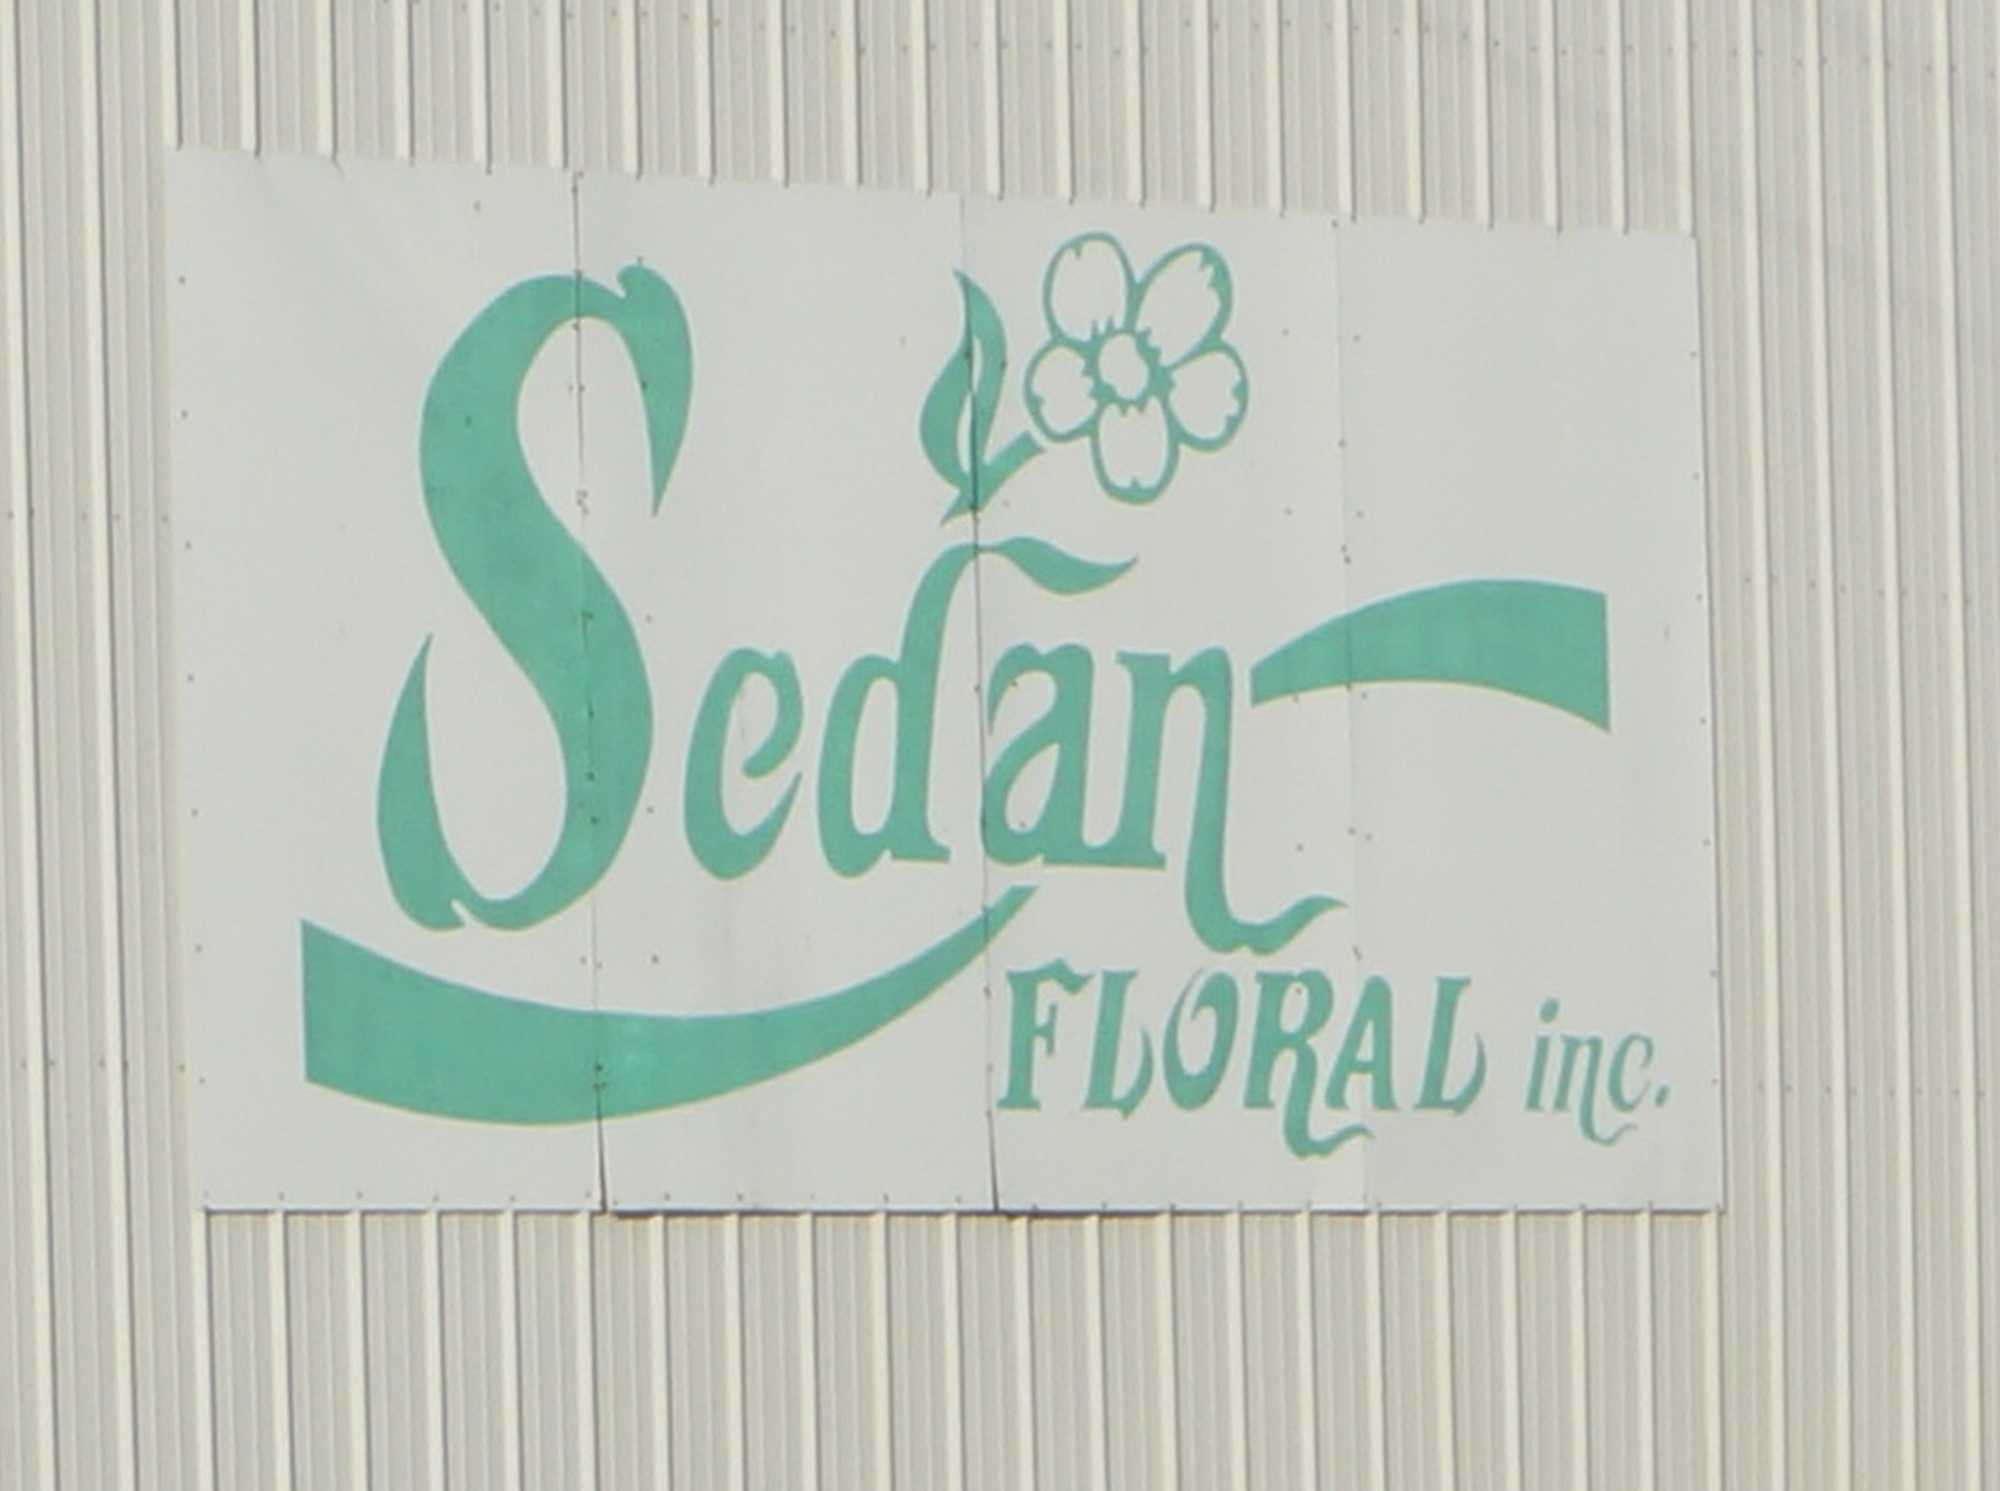 1 Sedan Floral sign